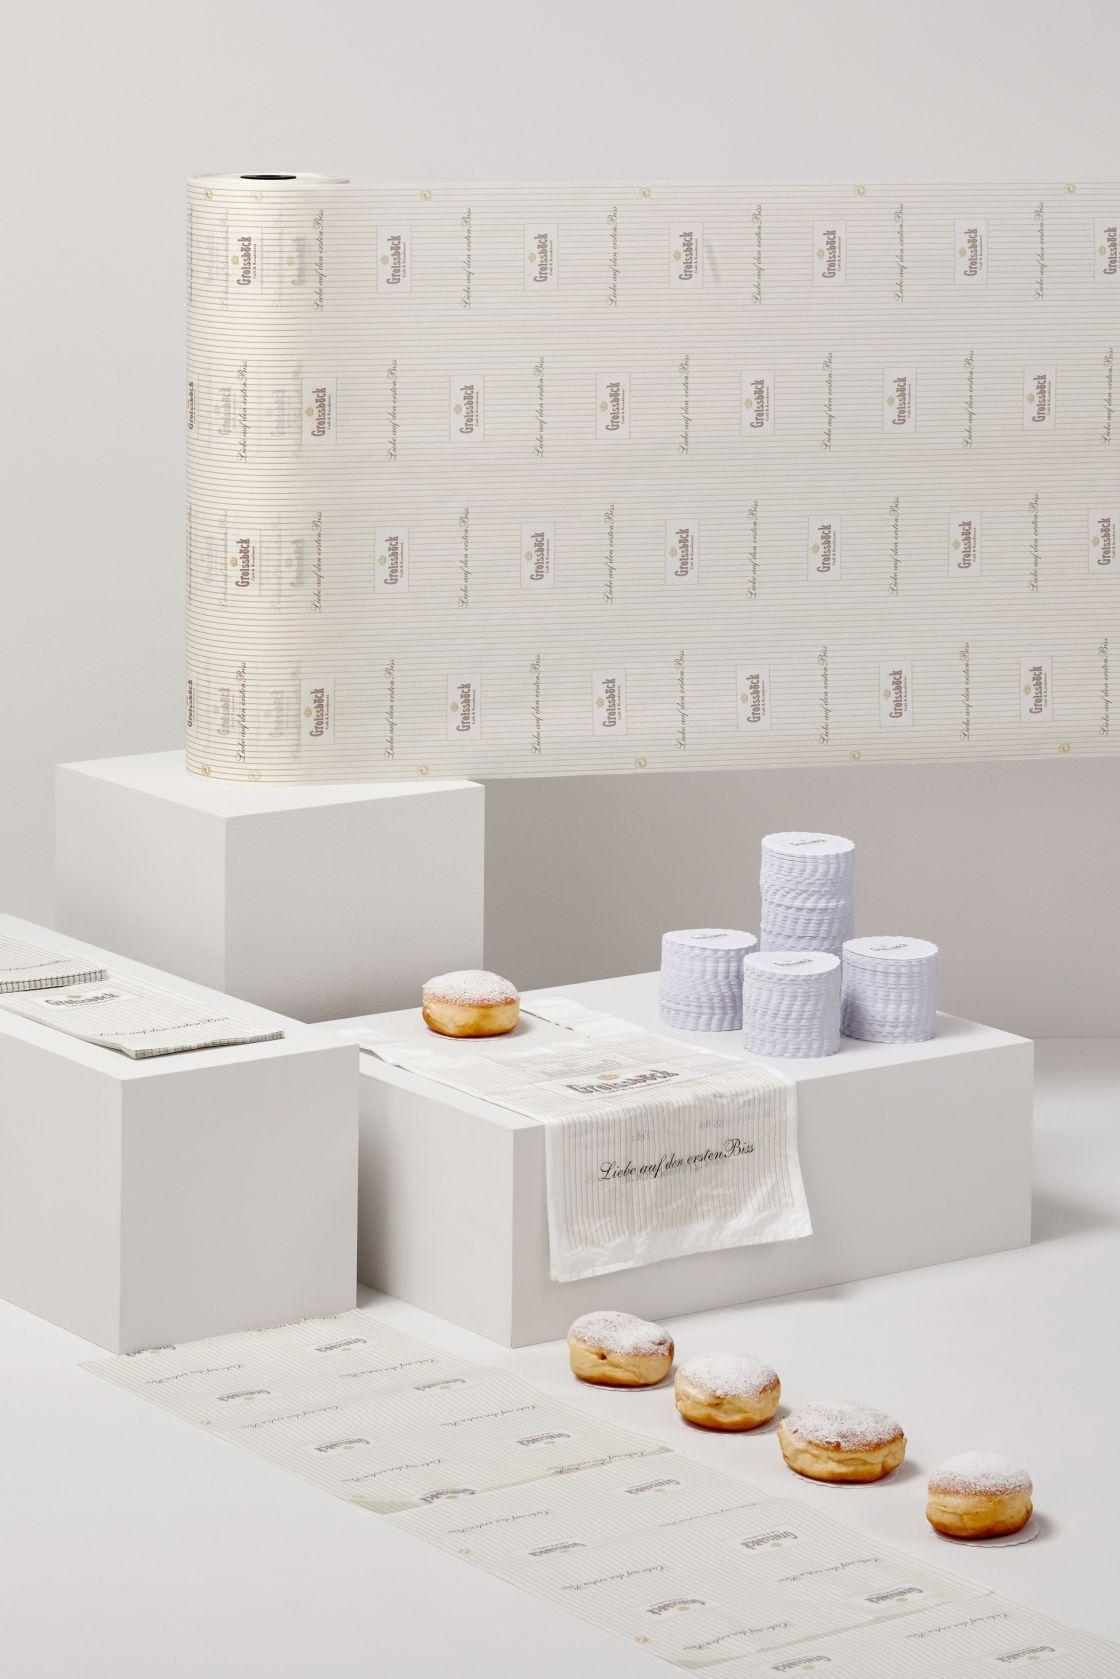 ASP Andreas Steiner Packaging Verpackung Sortiment Referenzen Groissböck Café Konditorei